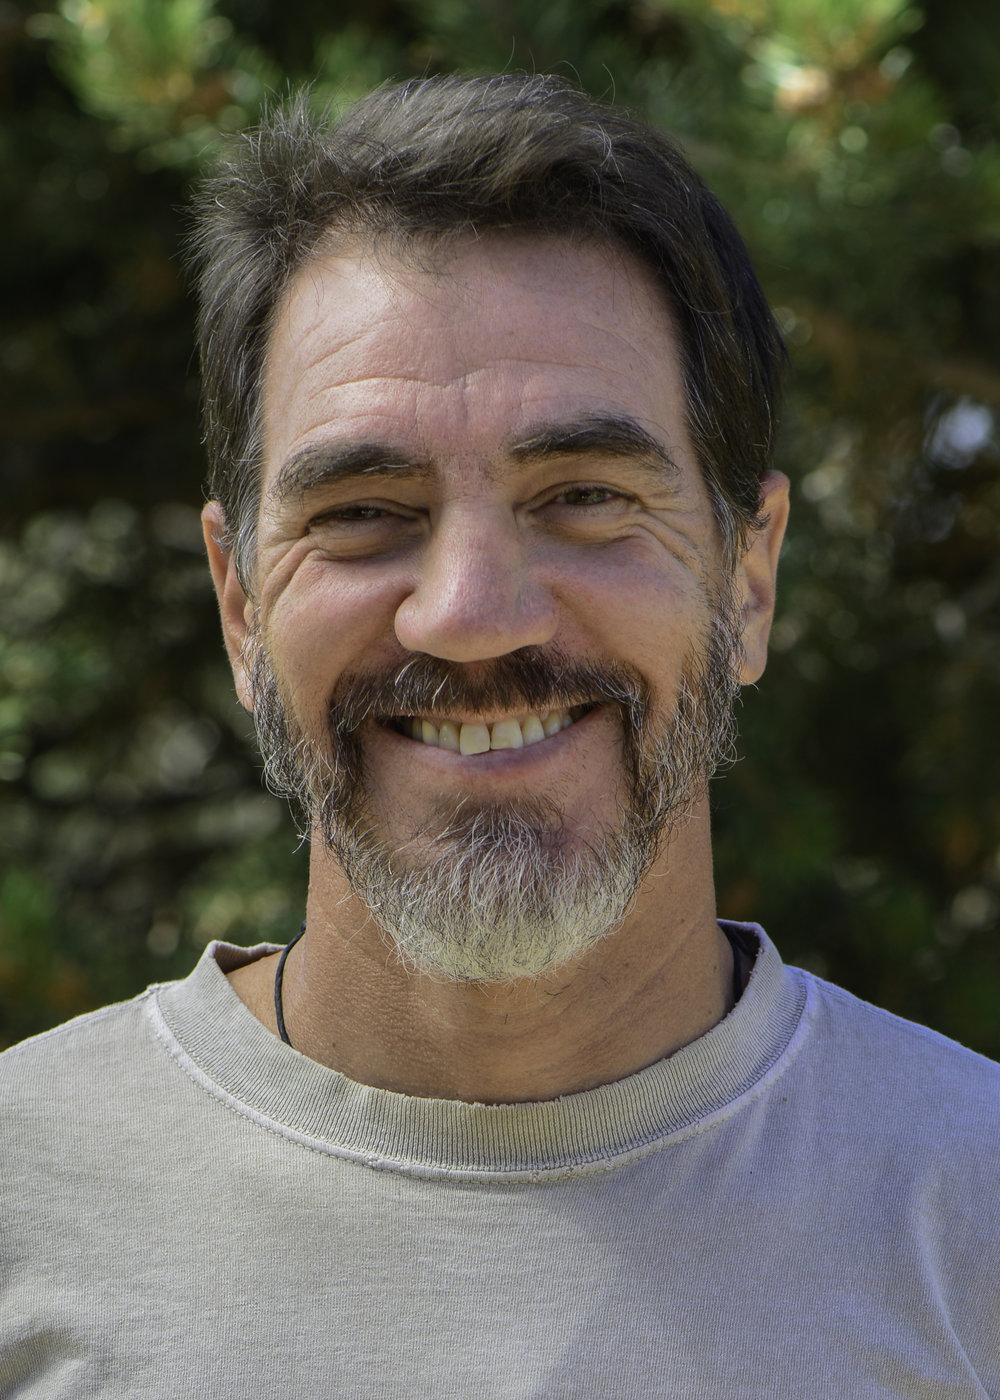 Coach Otero